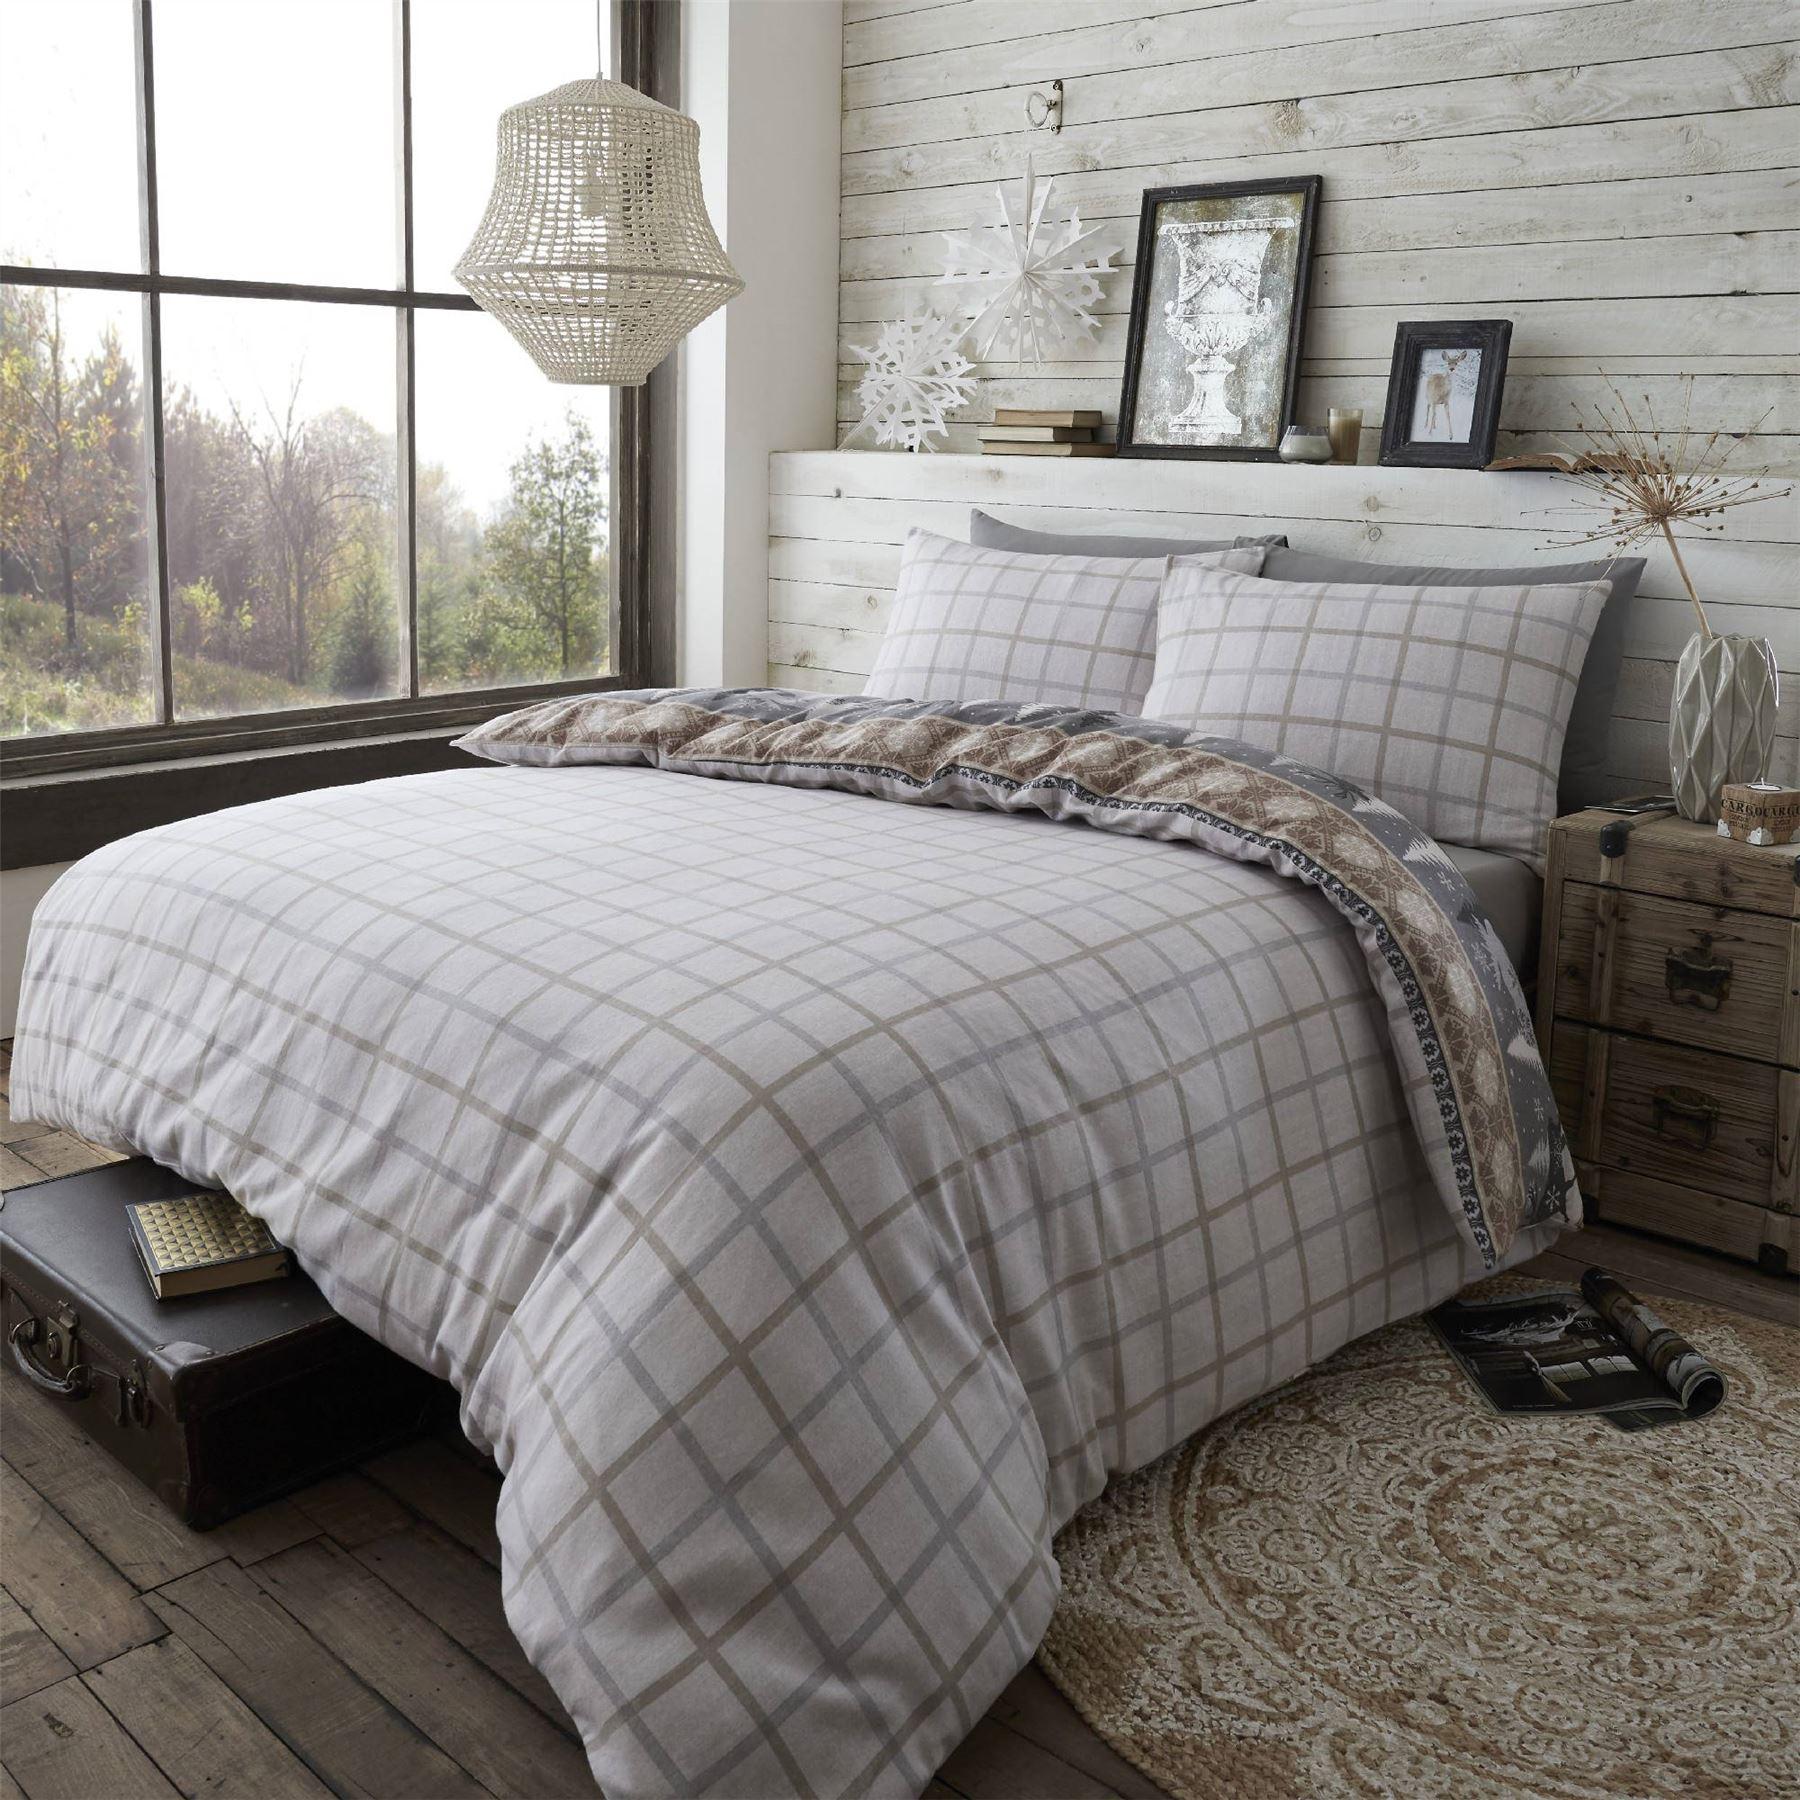 HLC 100/% Brushed Cotton Nordic Scandi Hygge Warm Reversible Duvet Cover Set